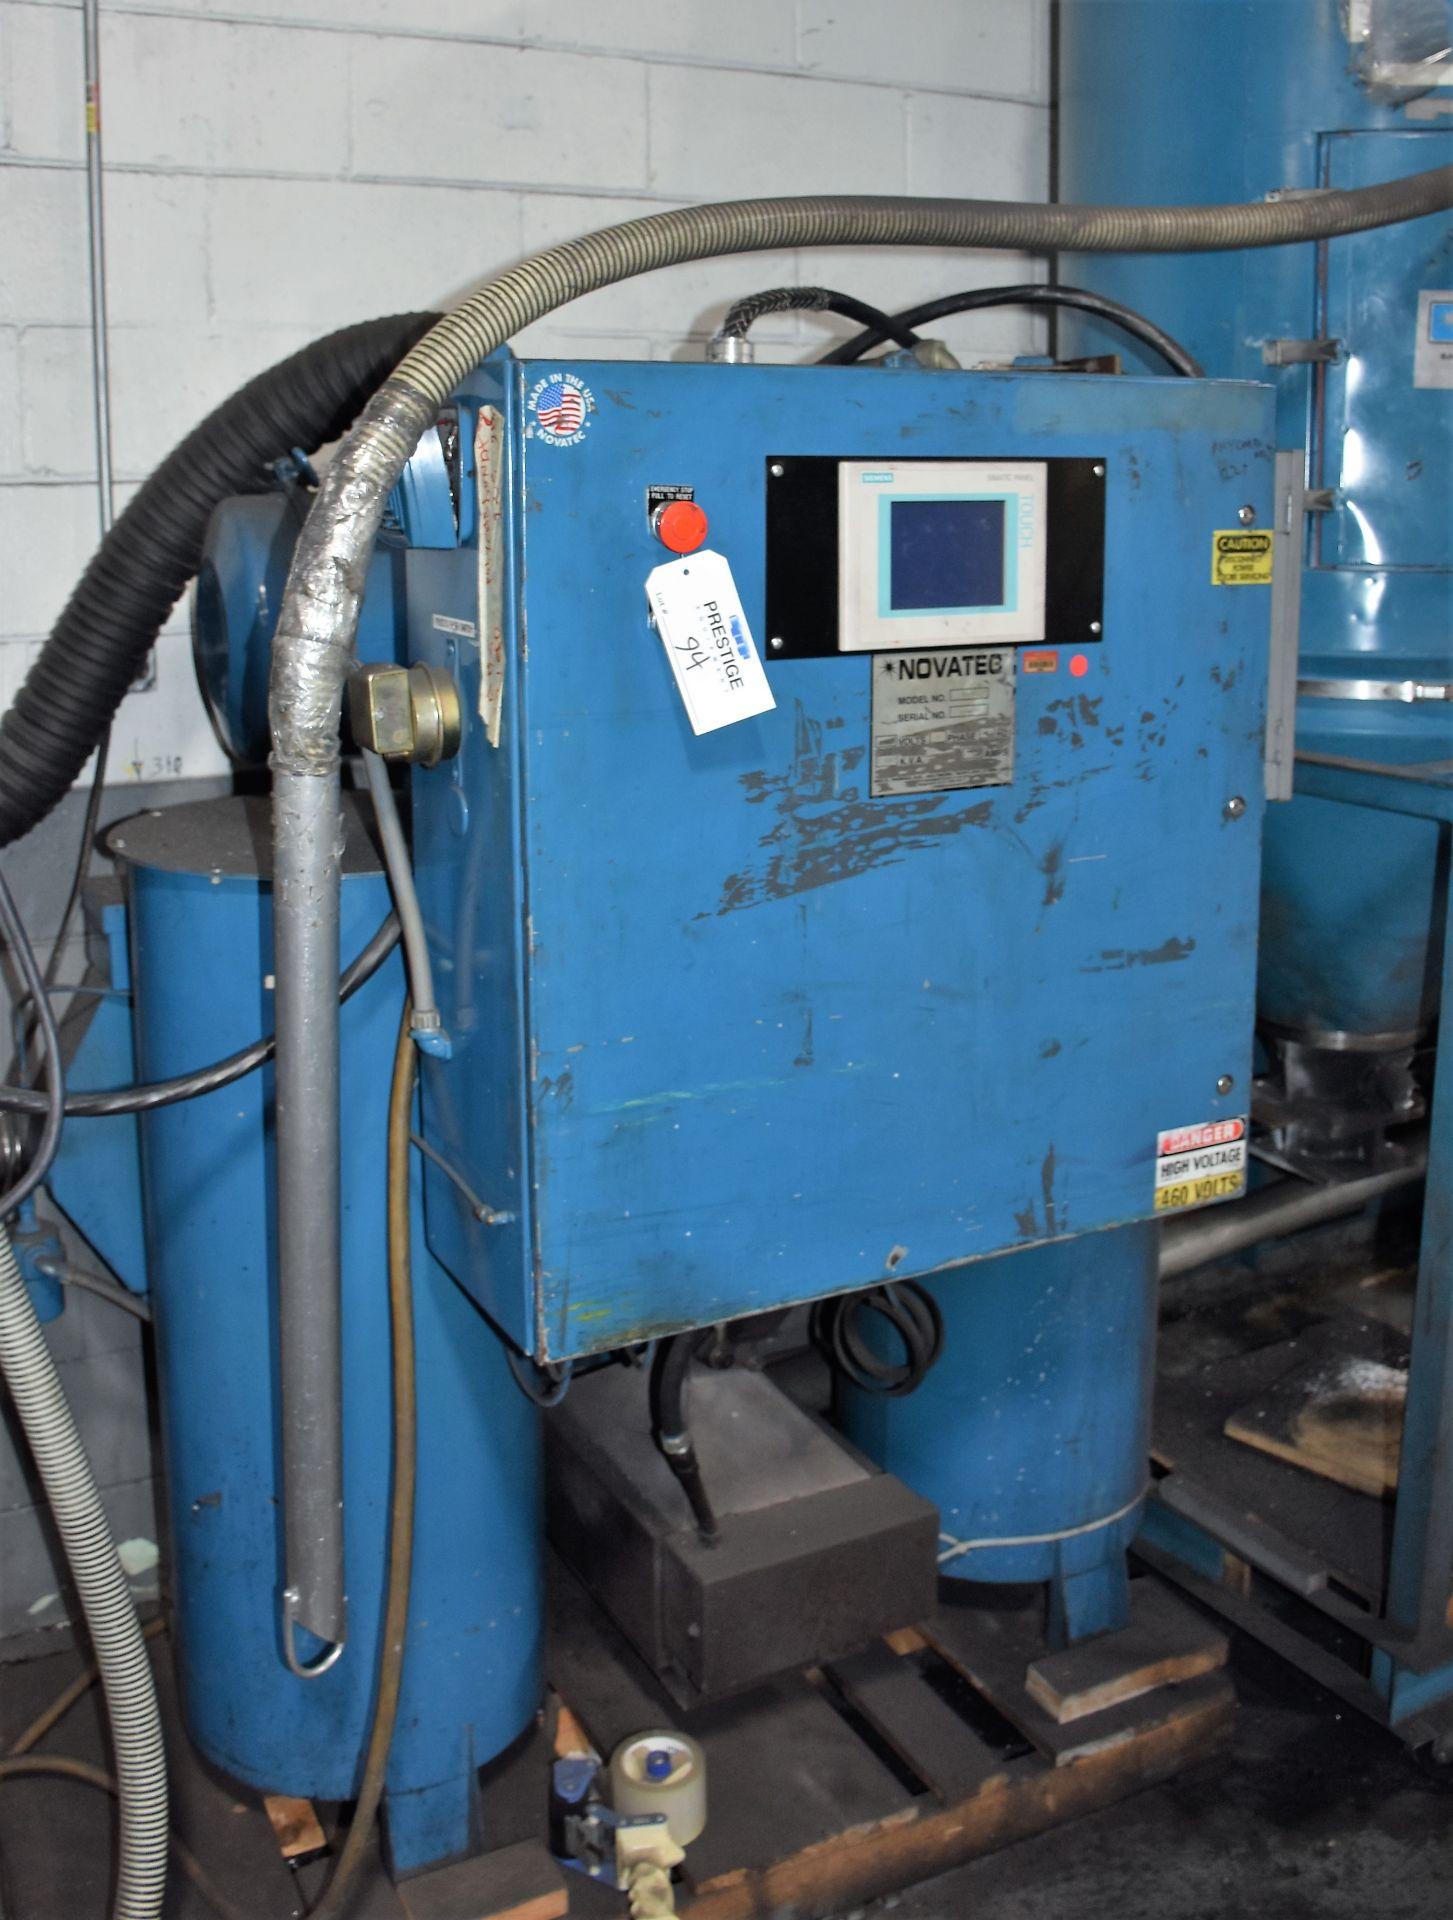 Novatec Vacum & Dryer, NPC-220 - Image 3 of 4